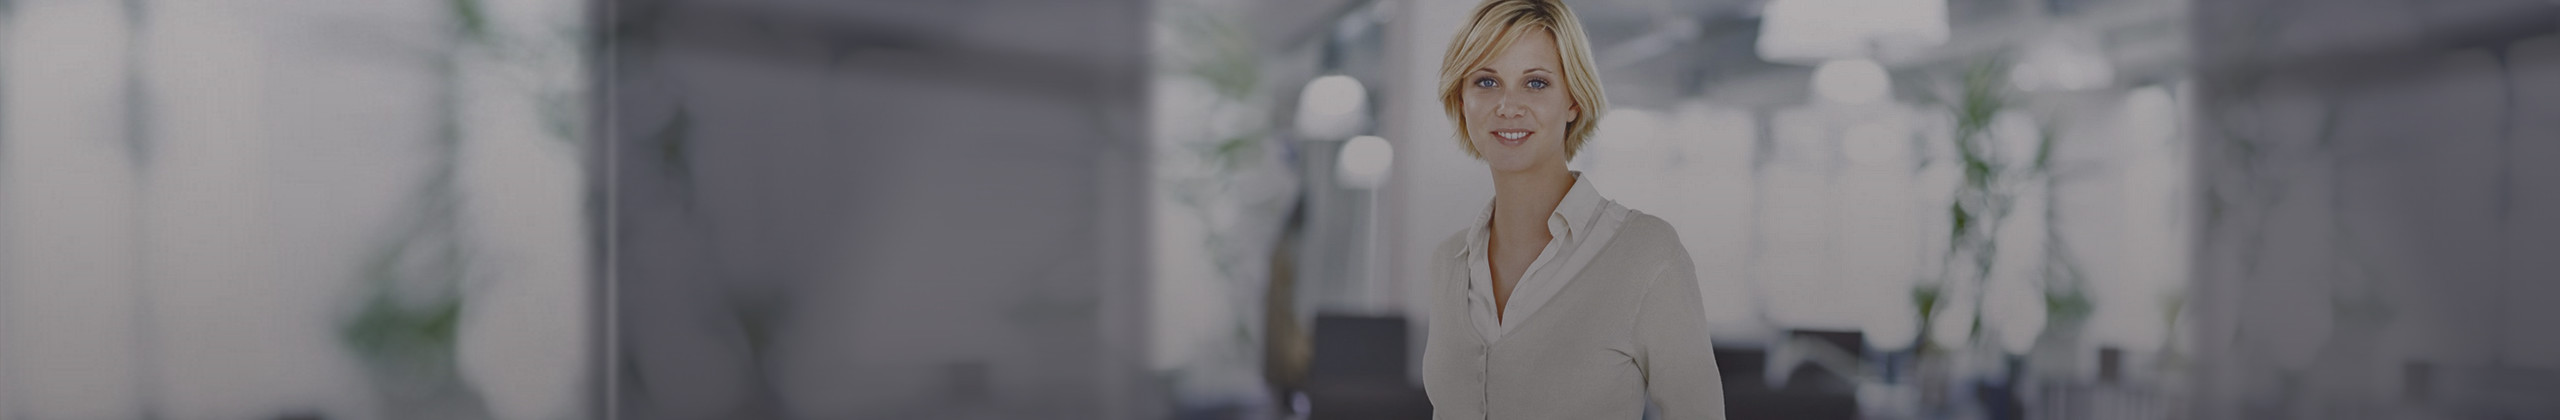 Blonde short hair | business app | Blue eyes